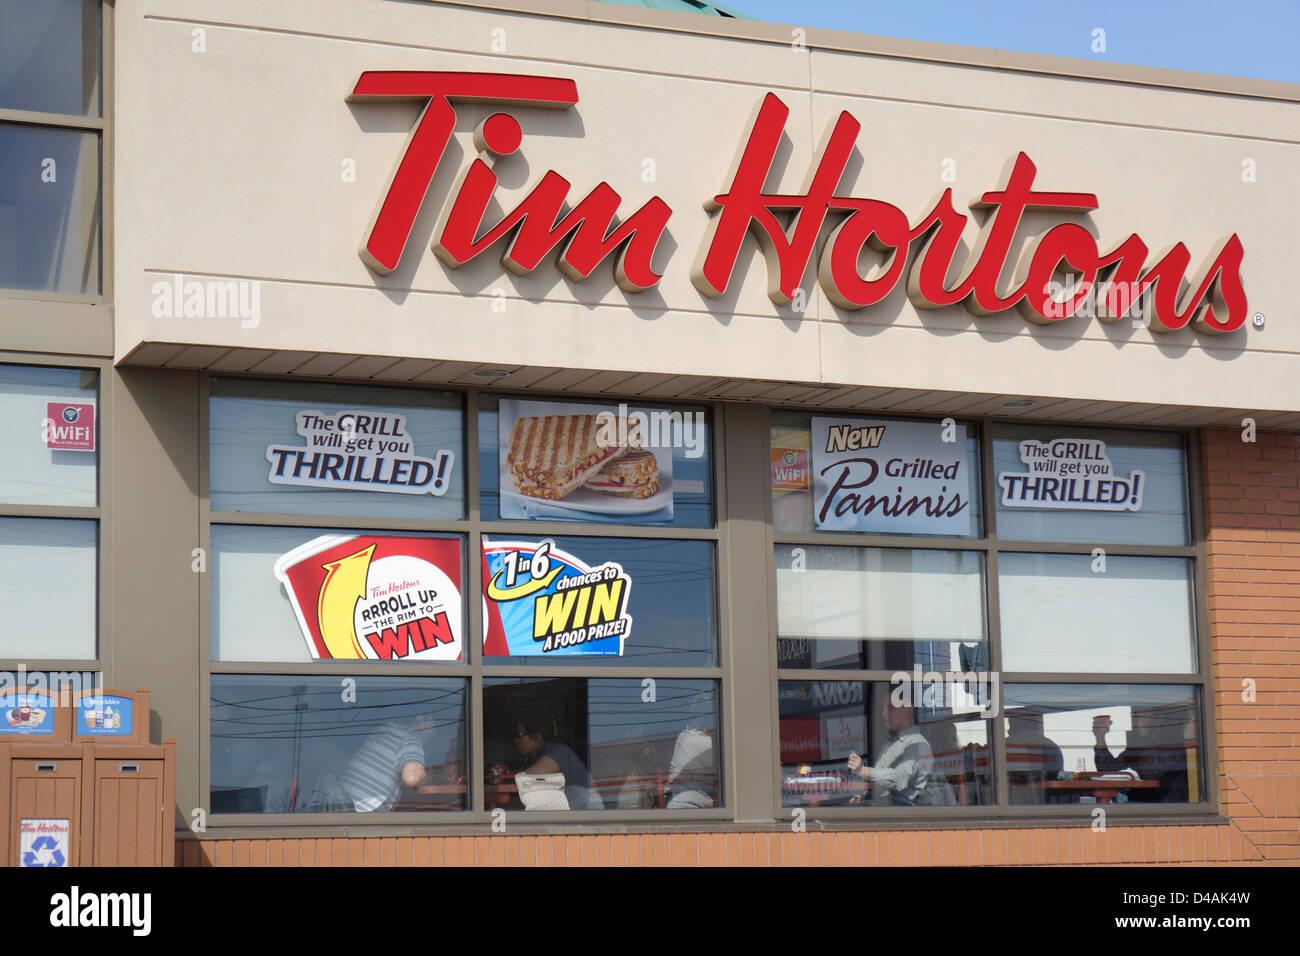 Tim Hortons - Stock Image